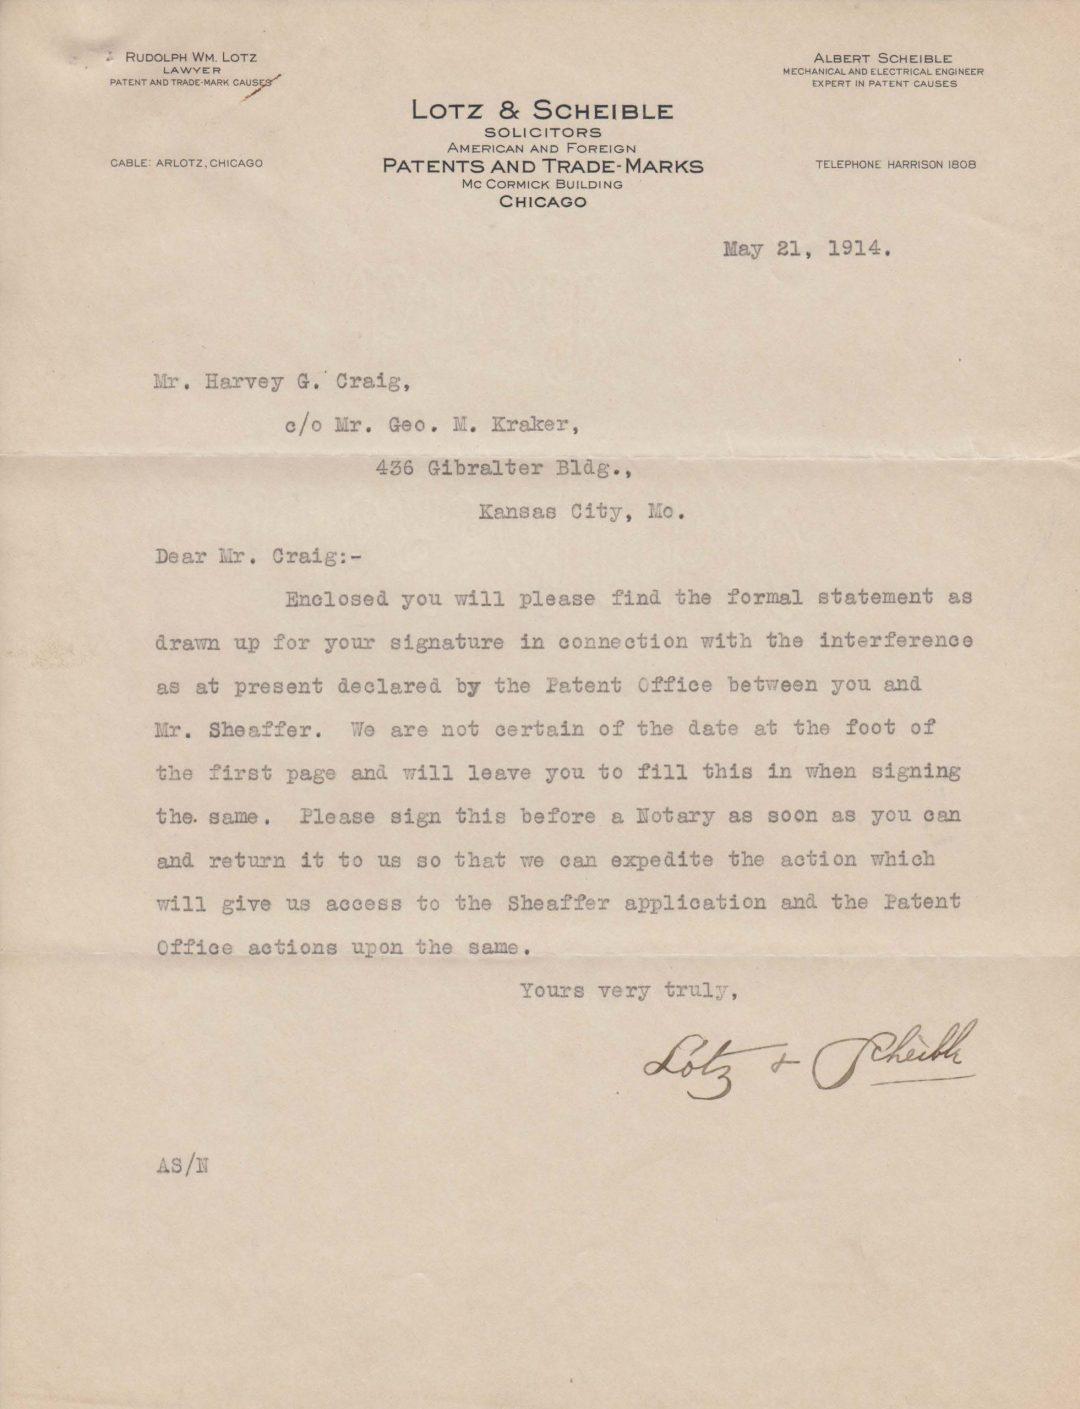 Letter to Harvey Craig 1914-05-21